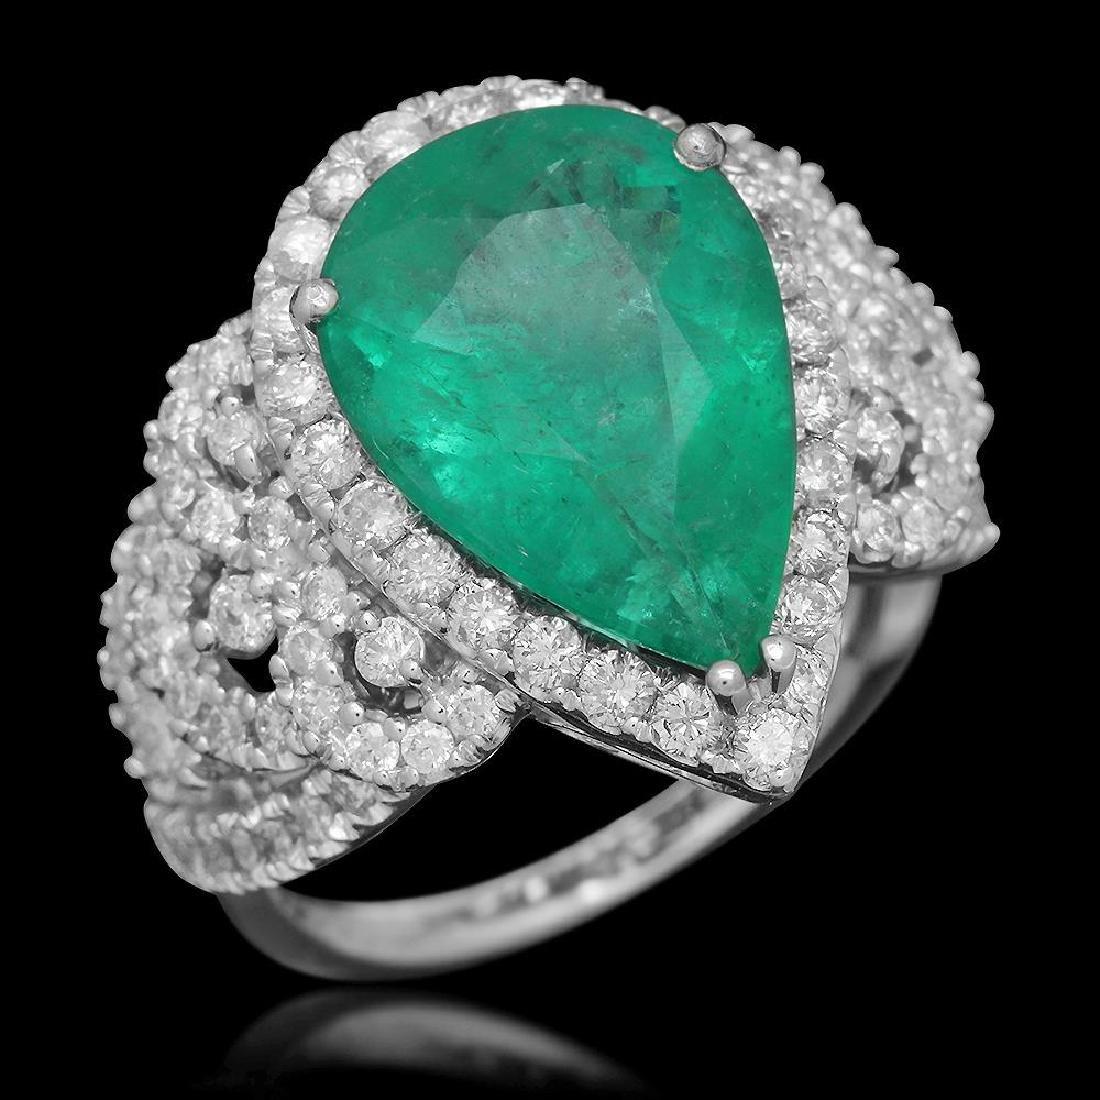 14K Gold 4.55 Emerald 1.20 Diamond Ring